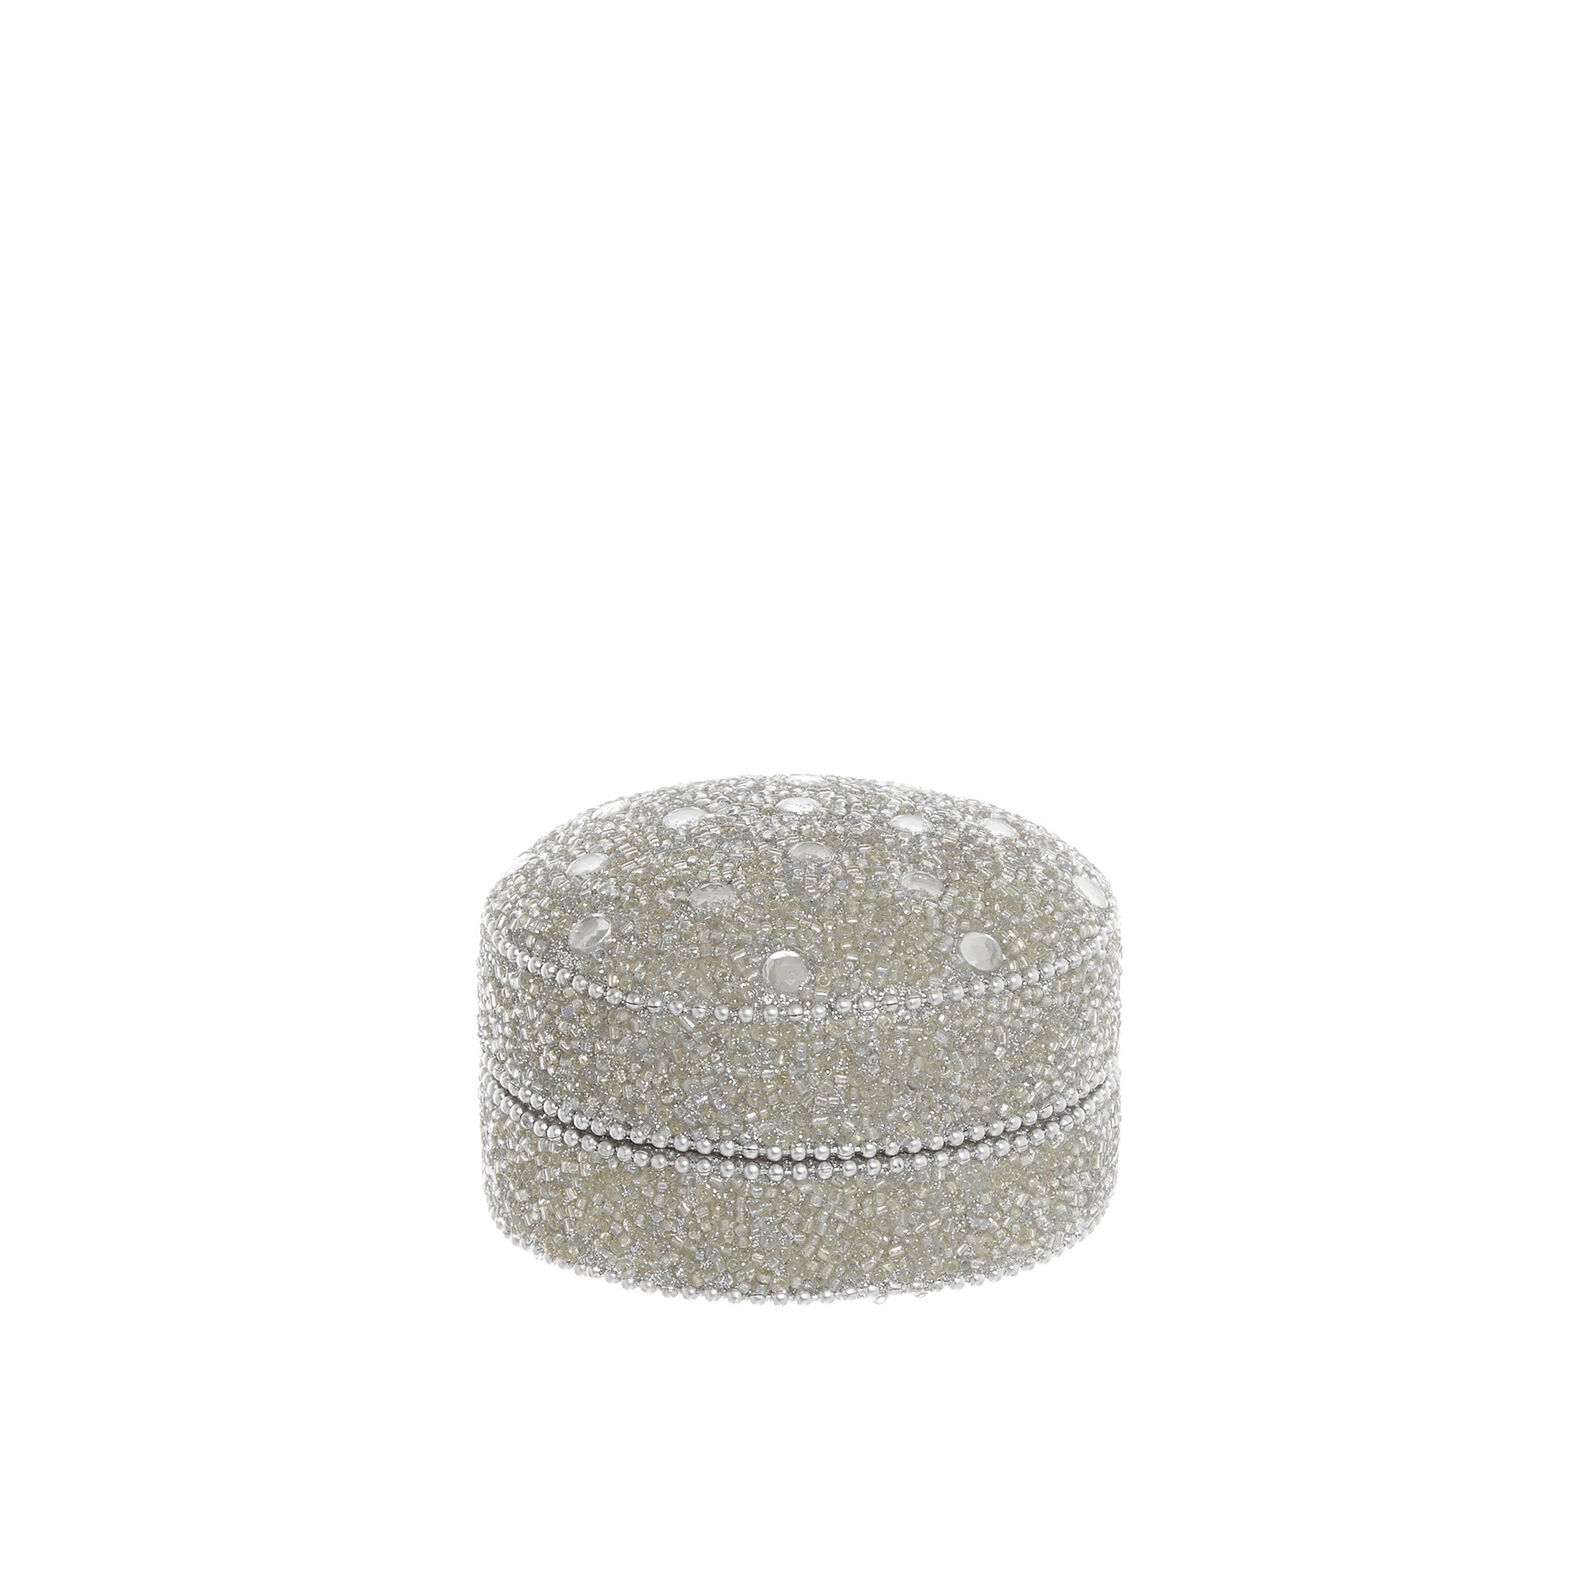 Handmade mini box with beads